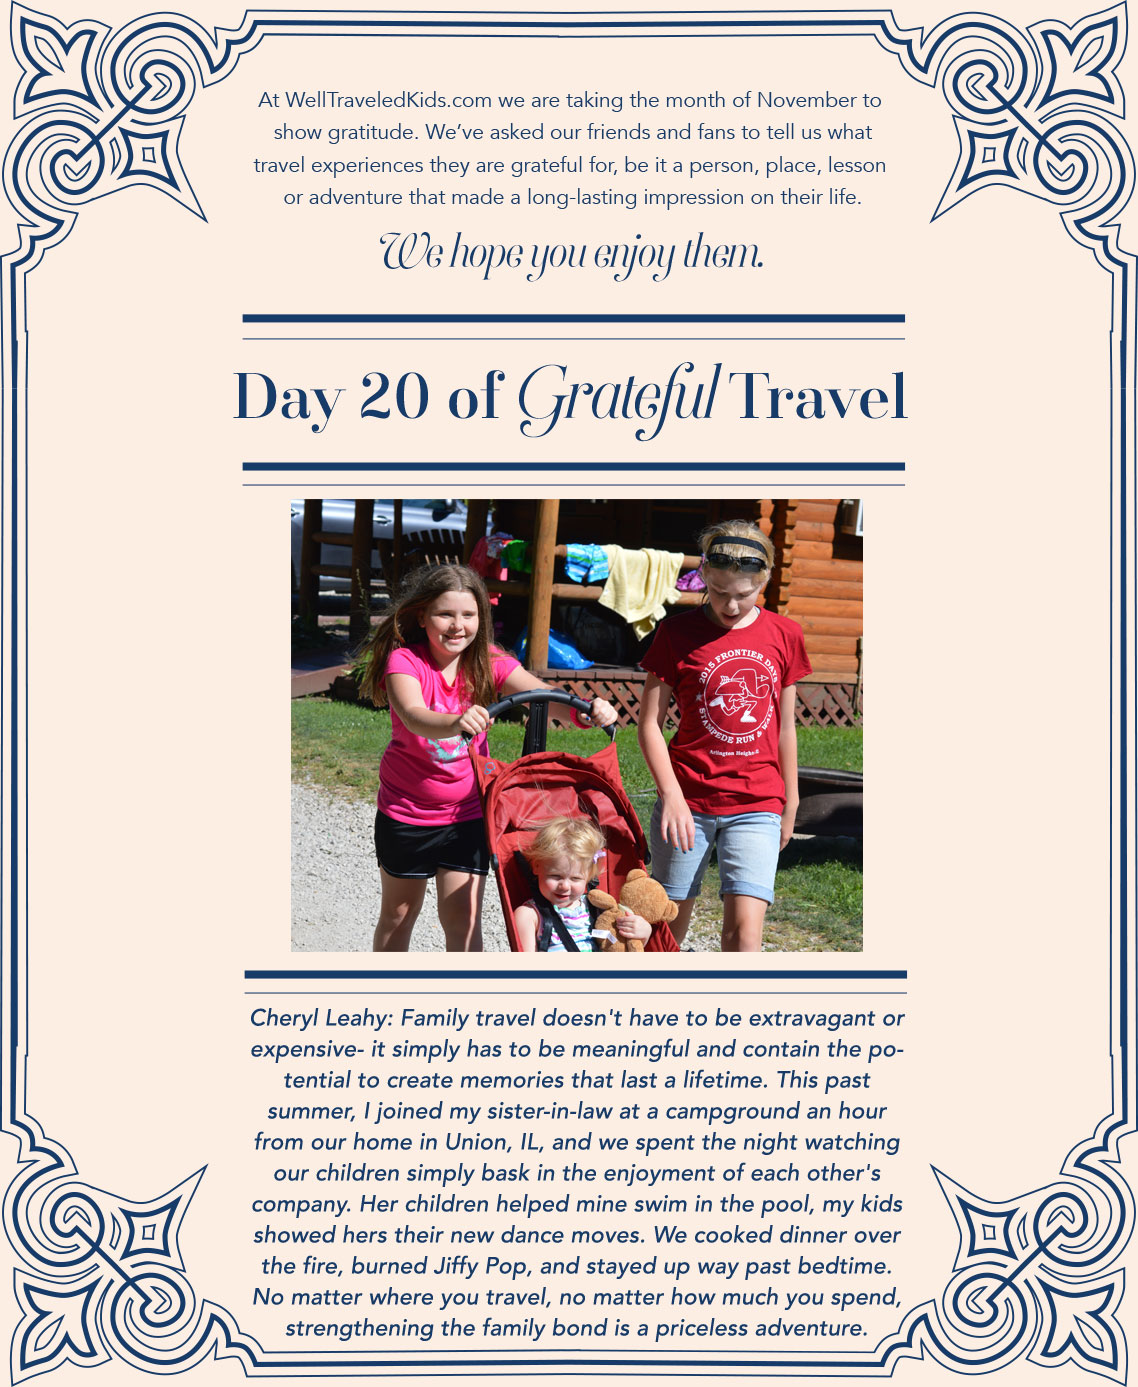 Day20_CherylLeahy